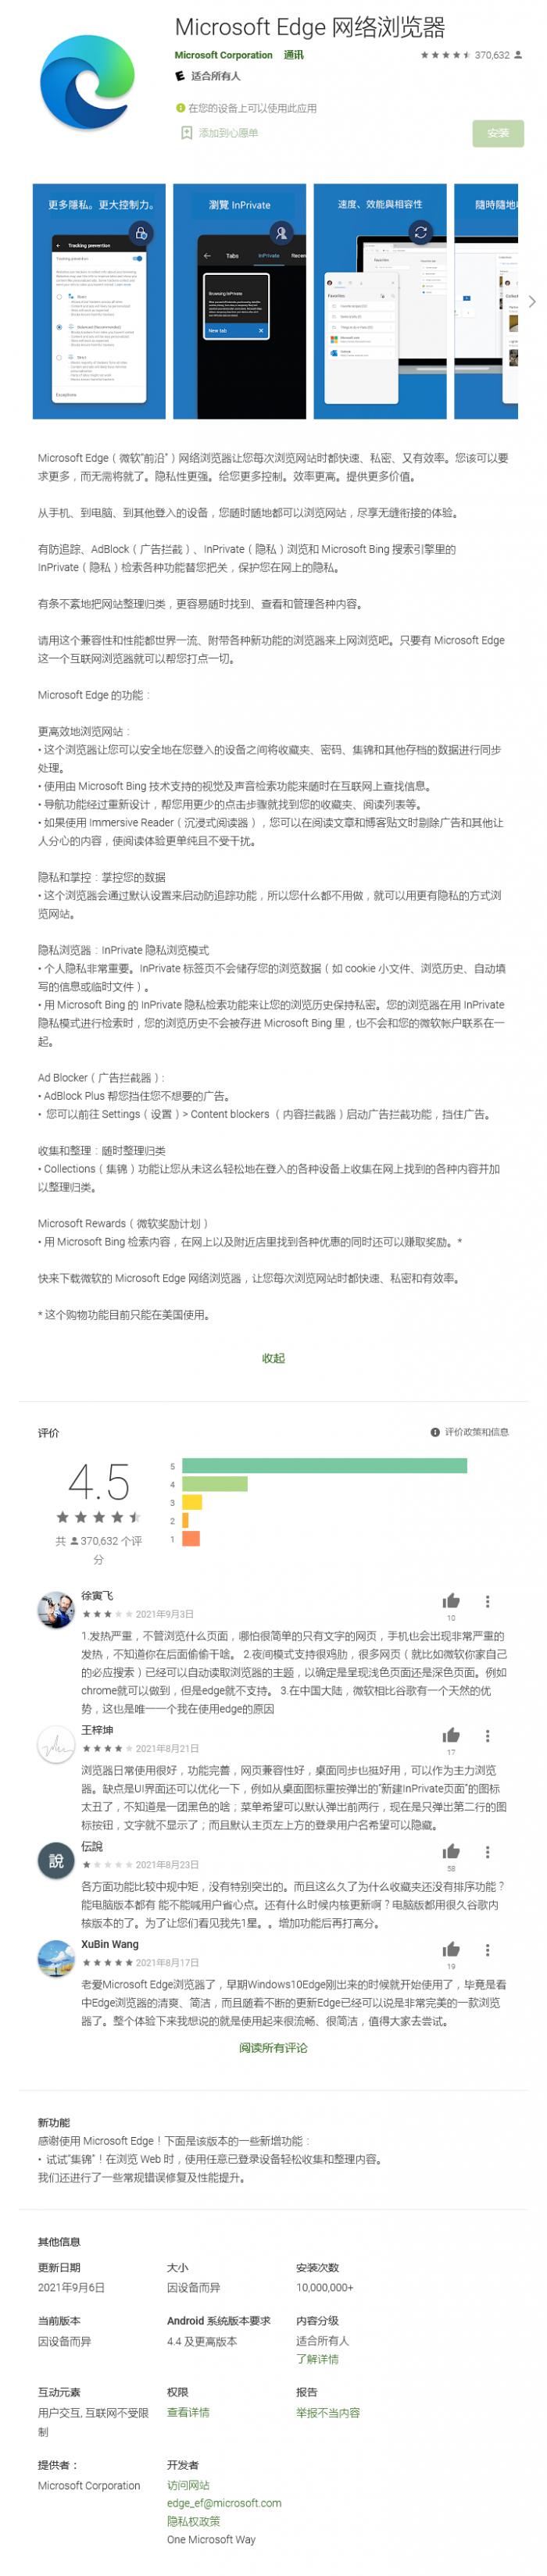 Screenshot 2021-09-07 at 11-31-50 Microsoft Edge 网络浏览器 - Google Play 上的应用.png